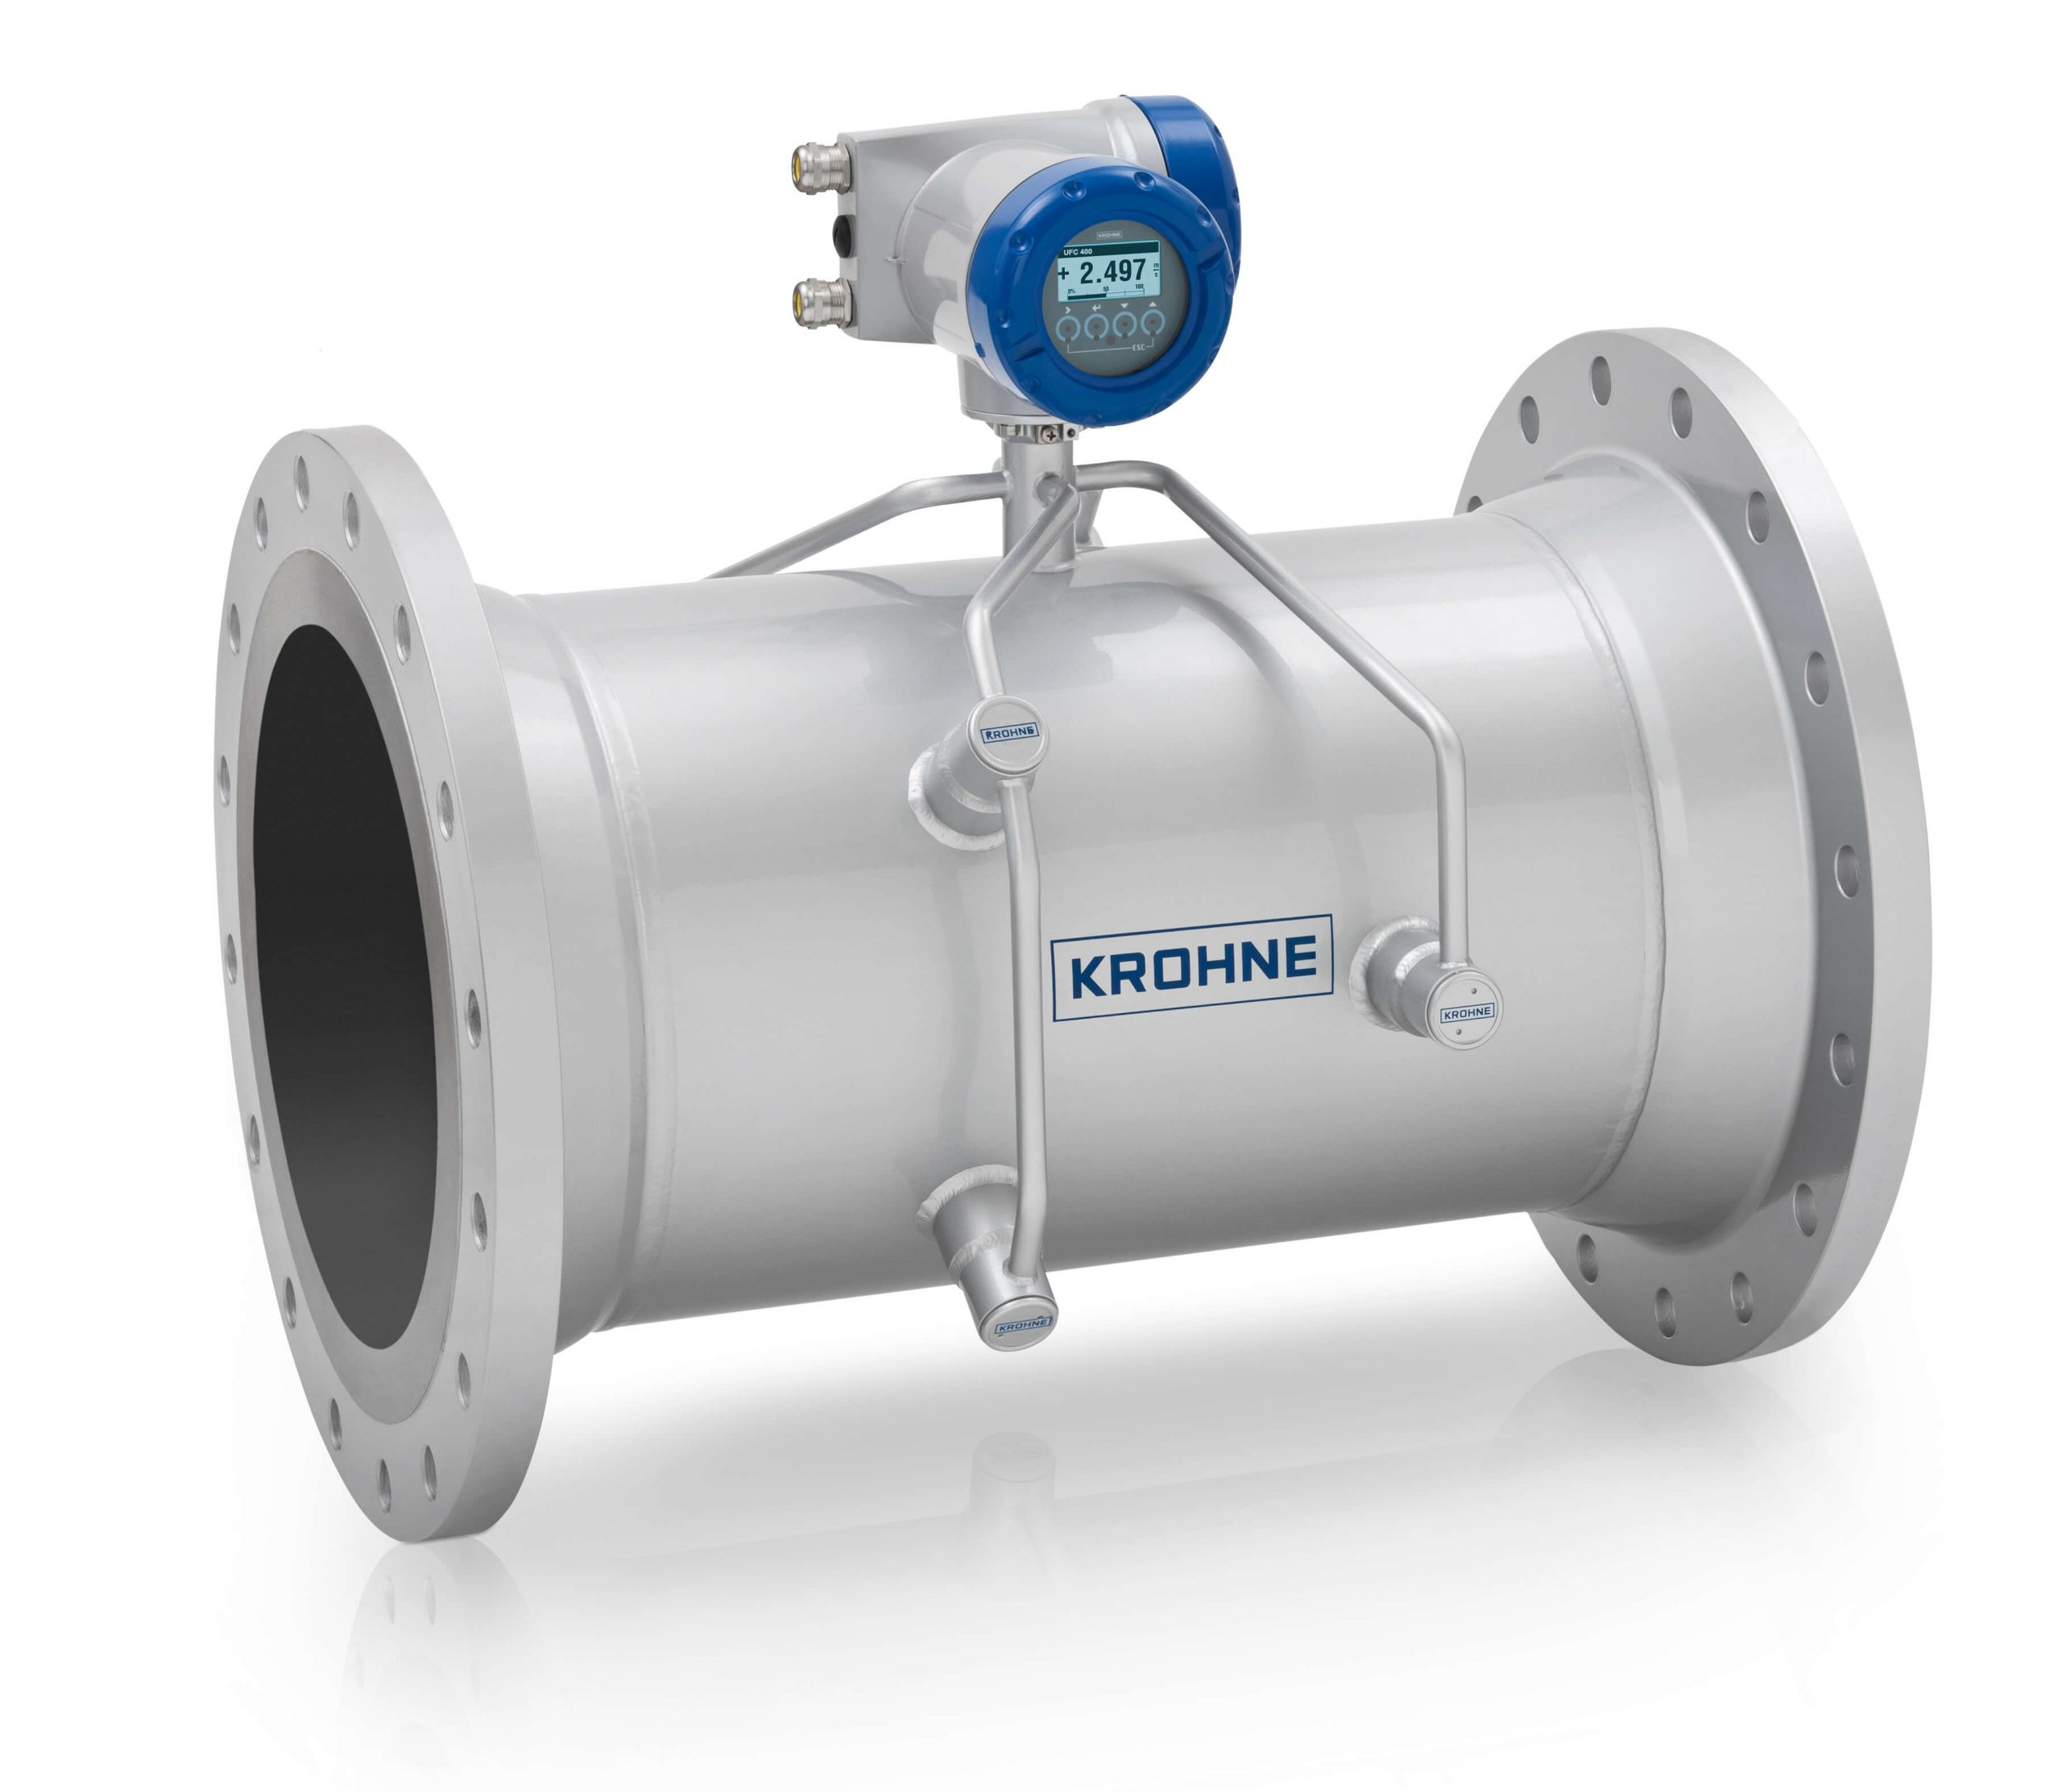 Dampfmengenzähler - ICM Technologies GmbH